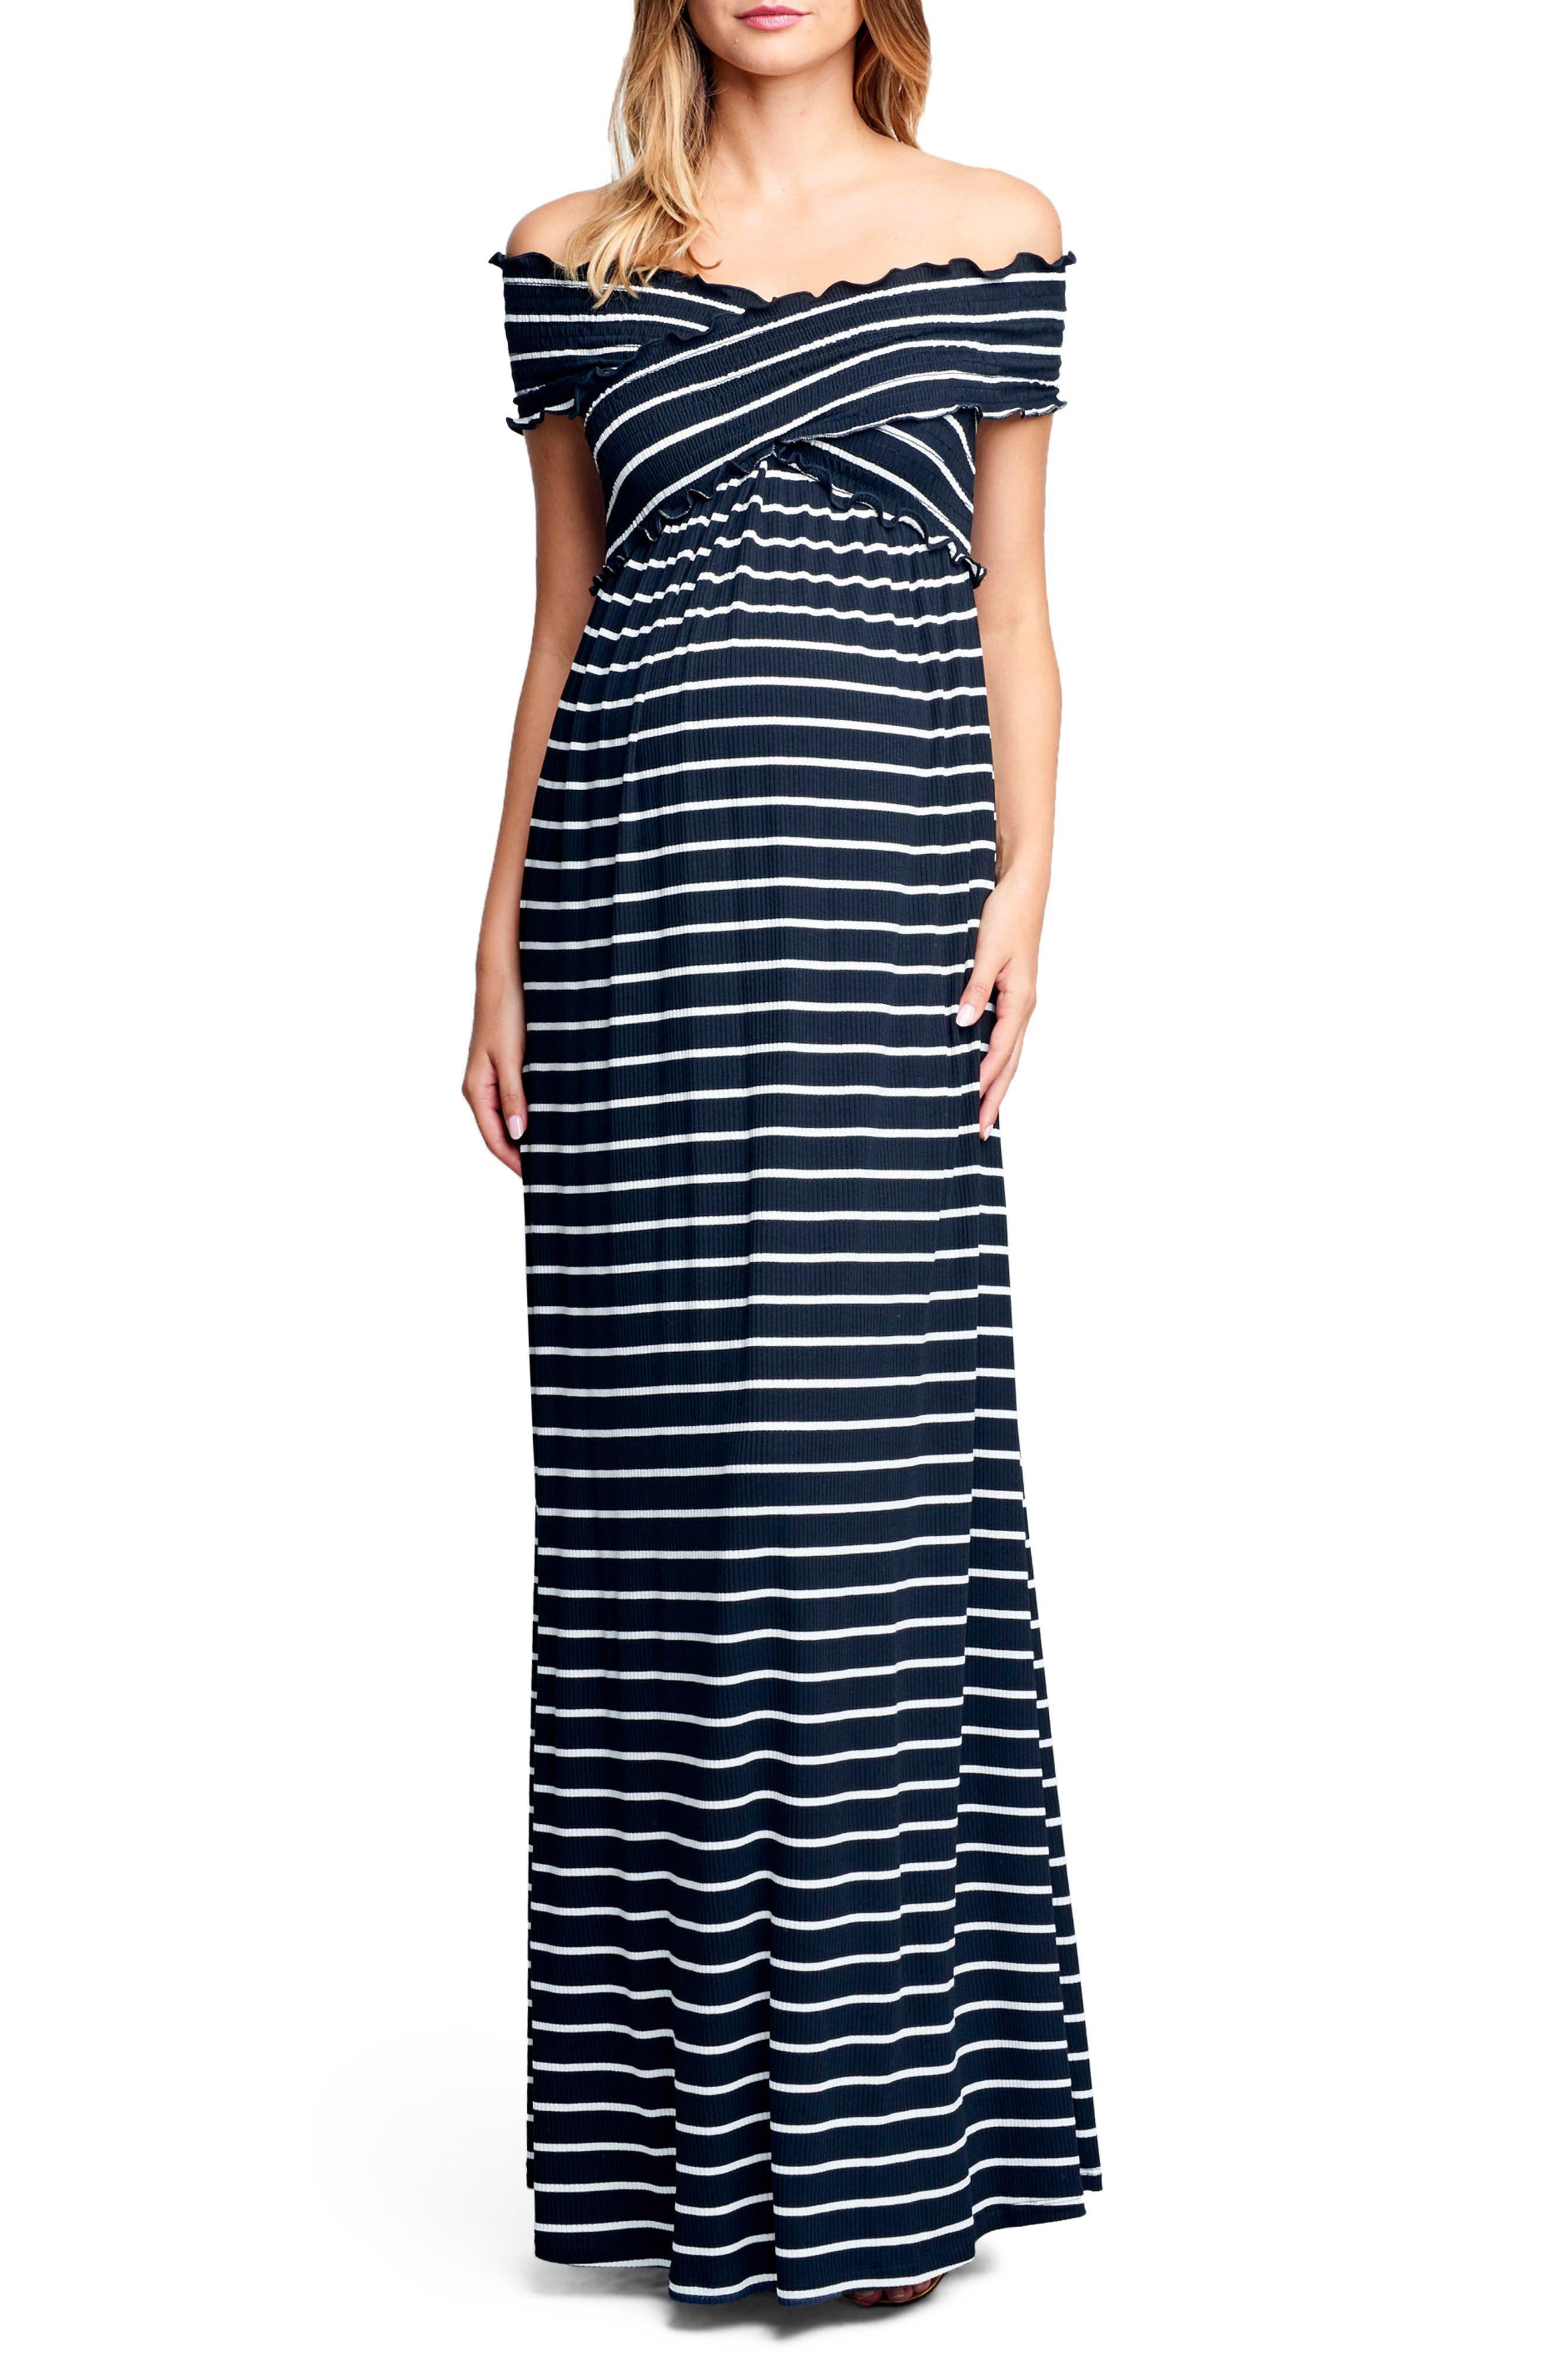 Maternal America Crisscross Off The Shoulder Maxi Maternity Dress, Black